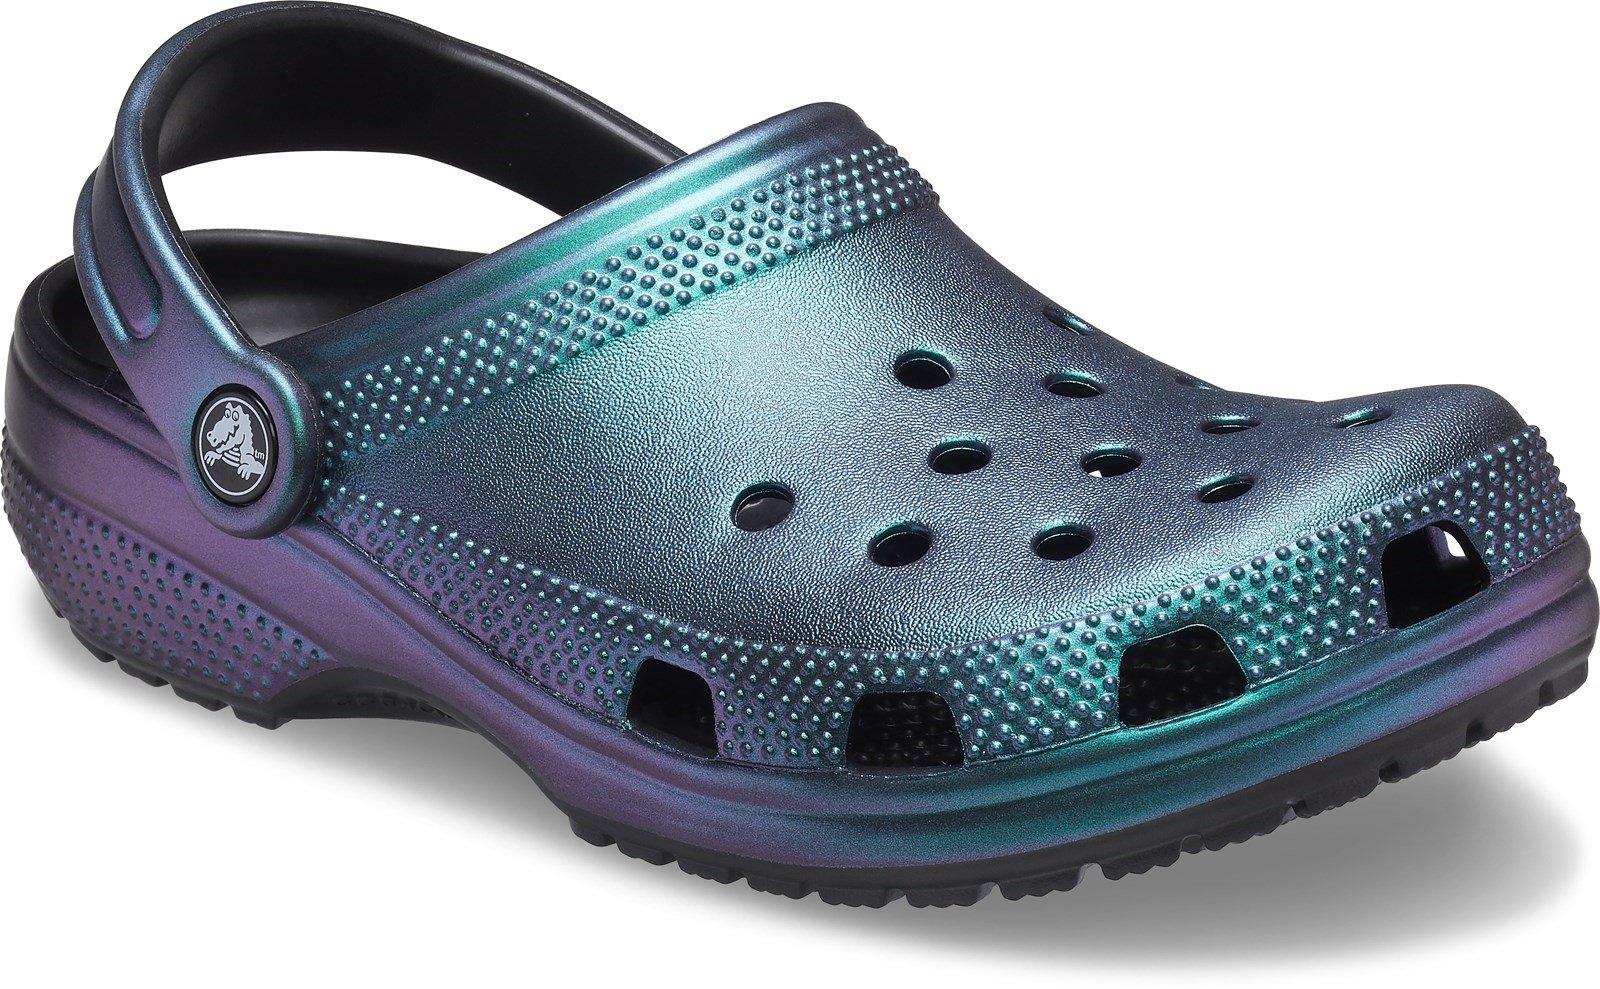 Crocs Women's Prismatic Beach Sandal Black 32075 - Black 3